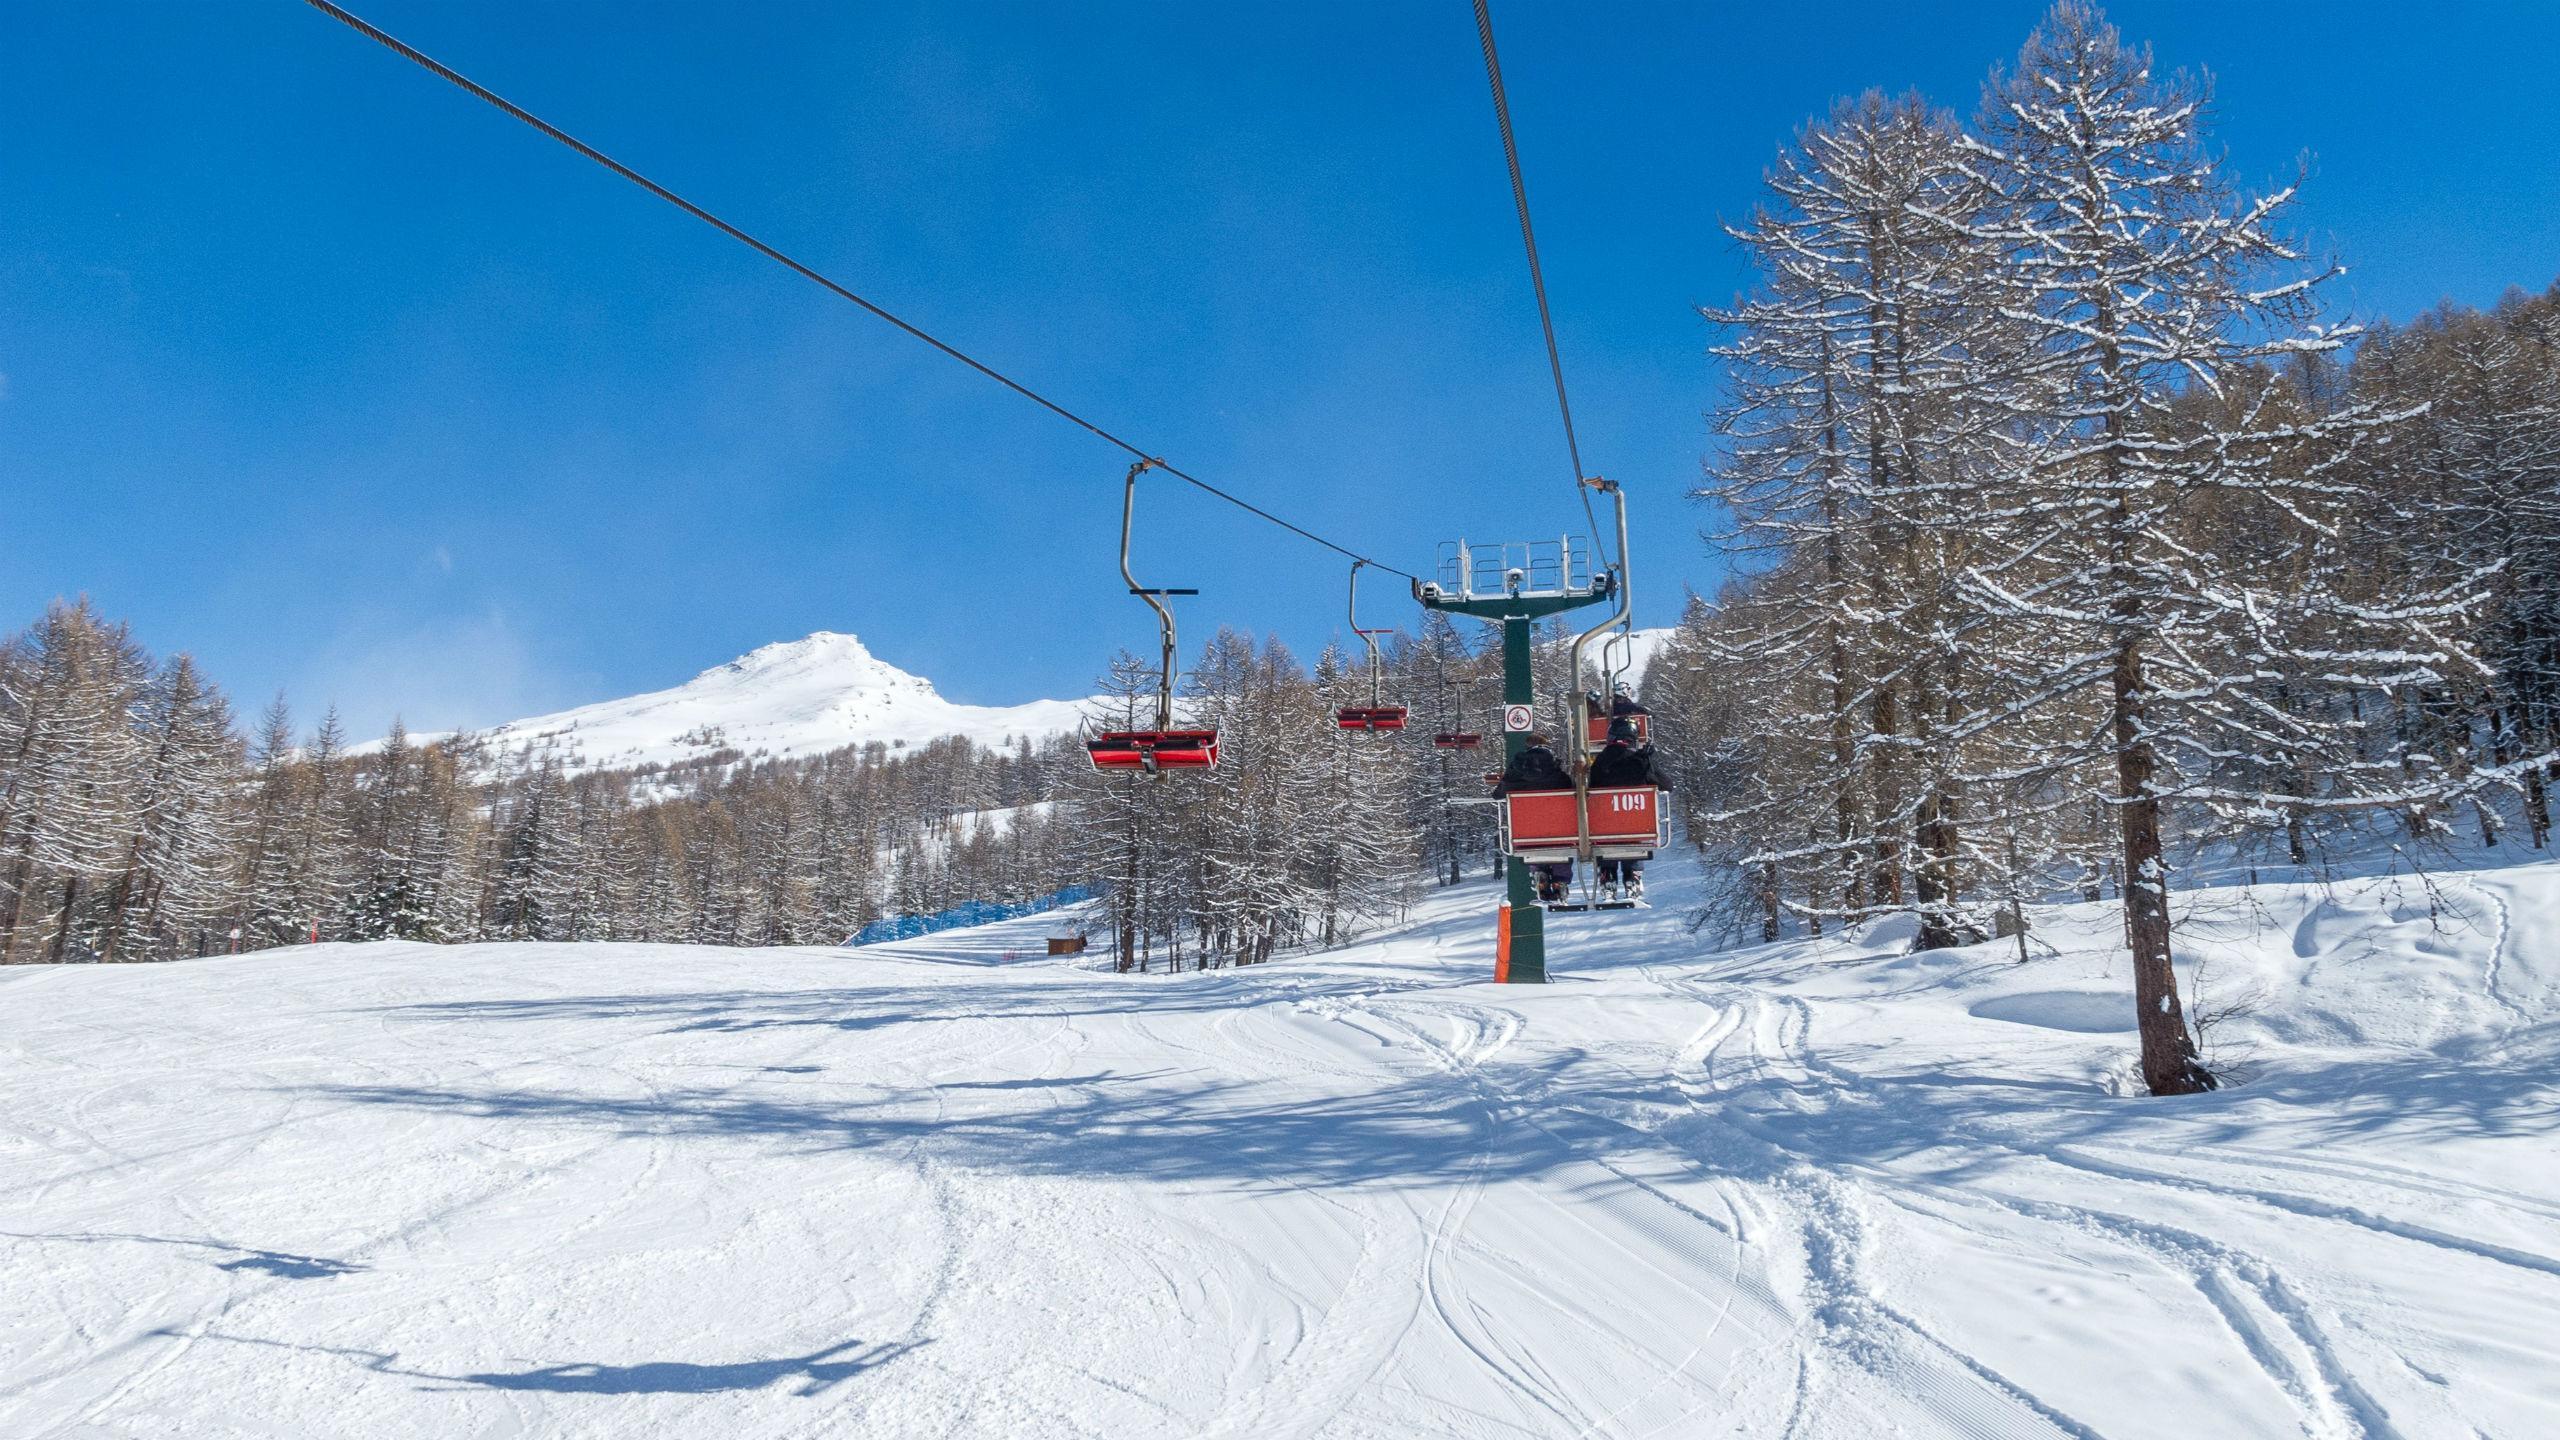 two skiers on a beginner ski lift in bardonecchia